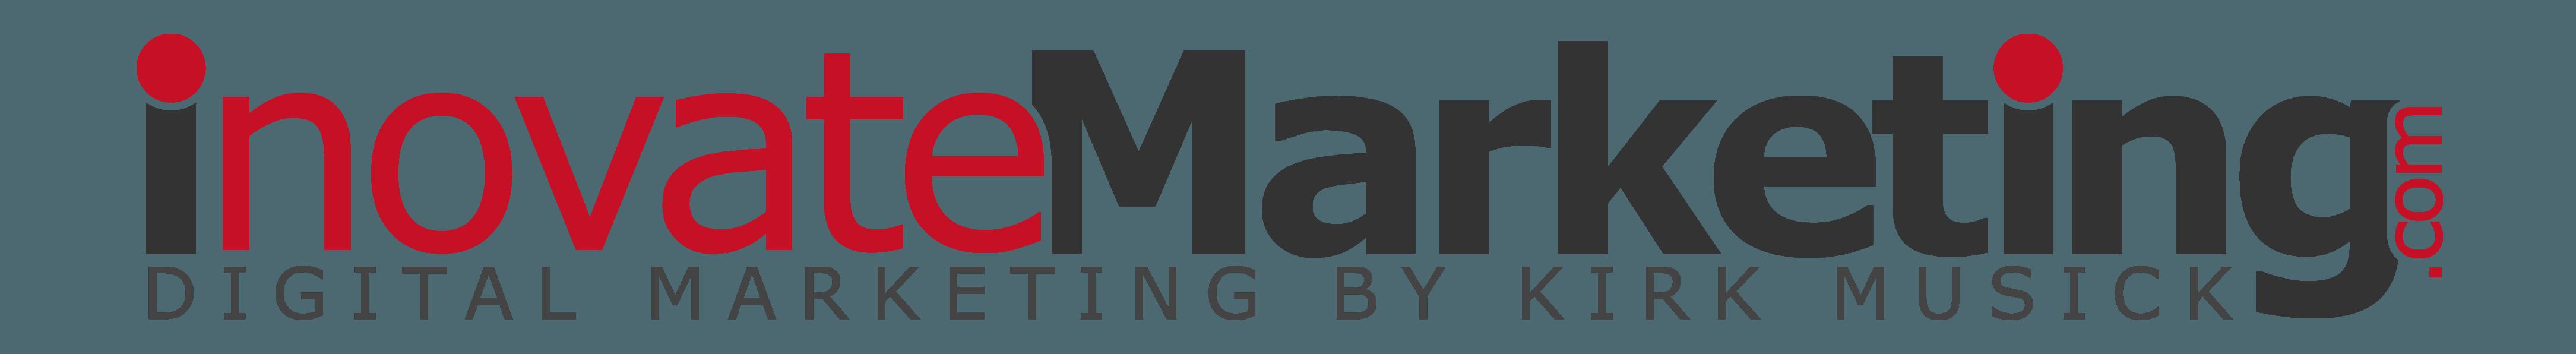 Inovate_Marketing